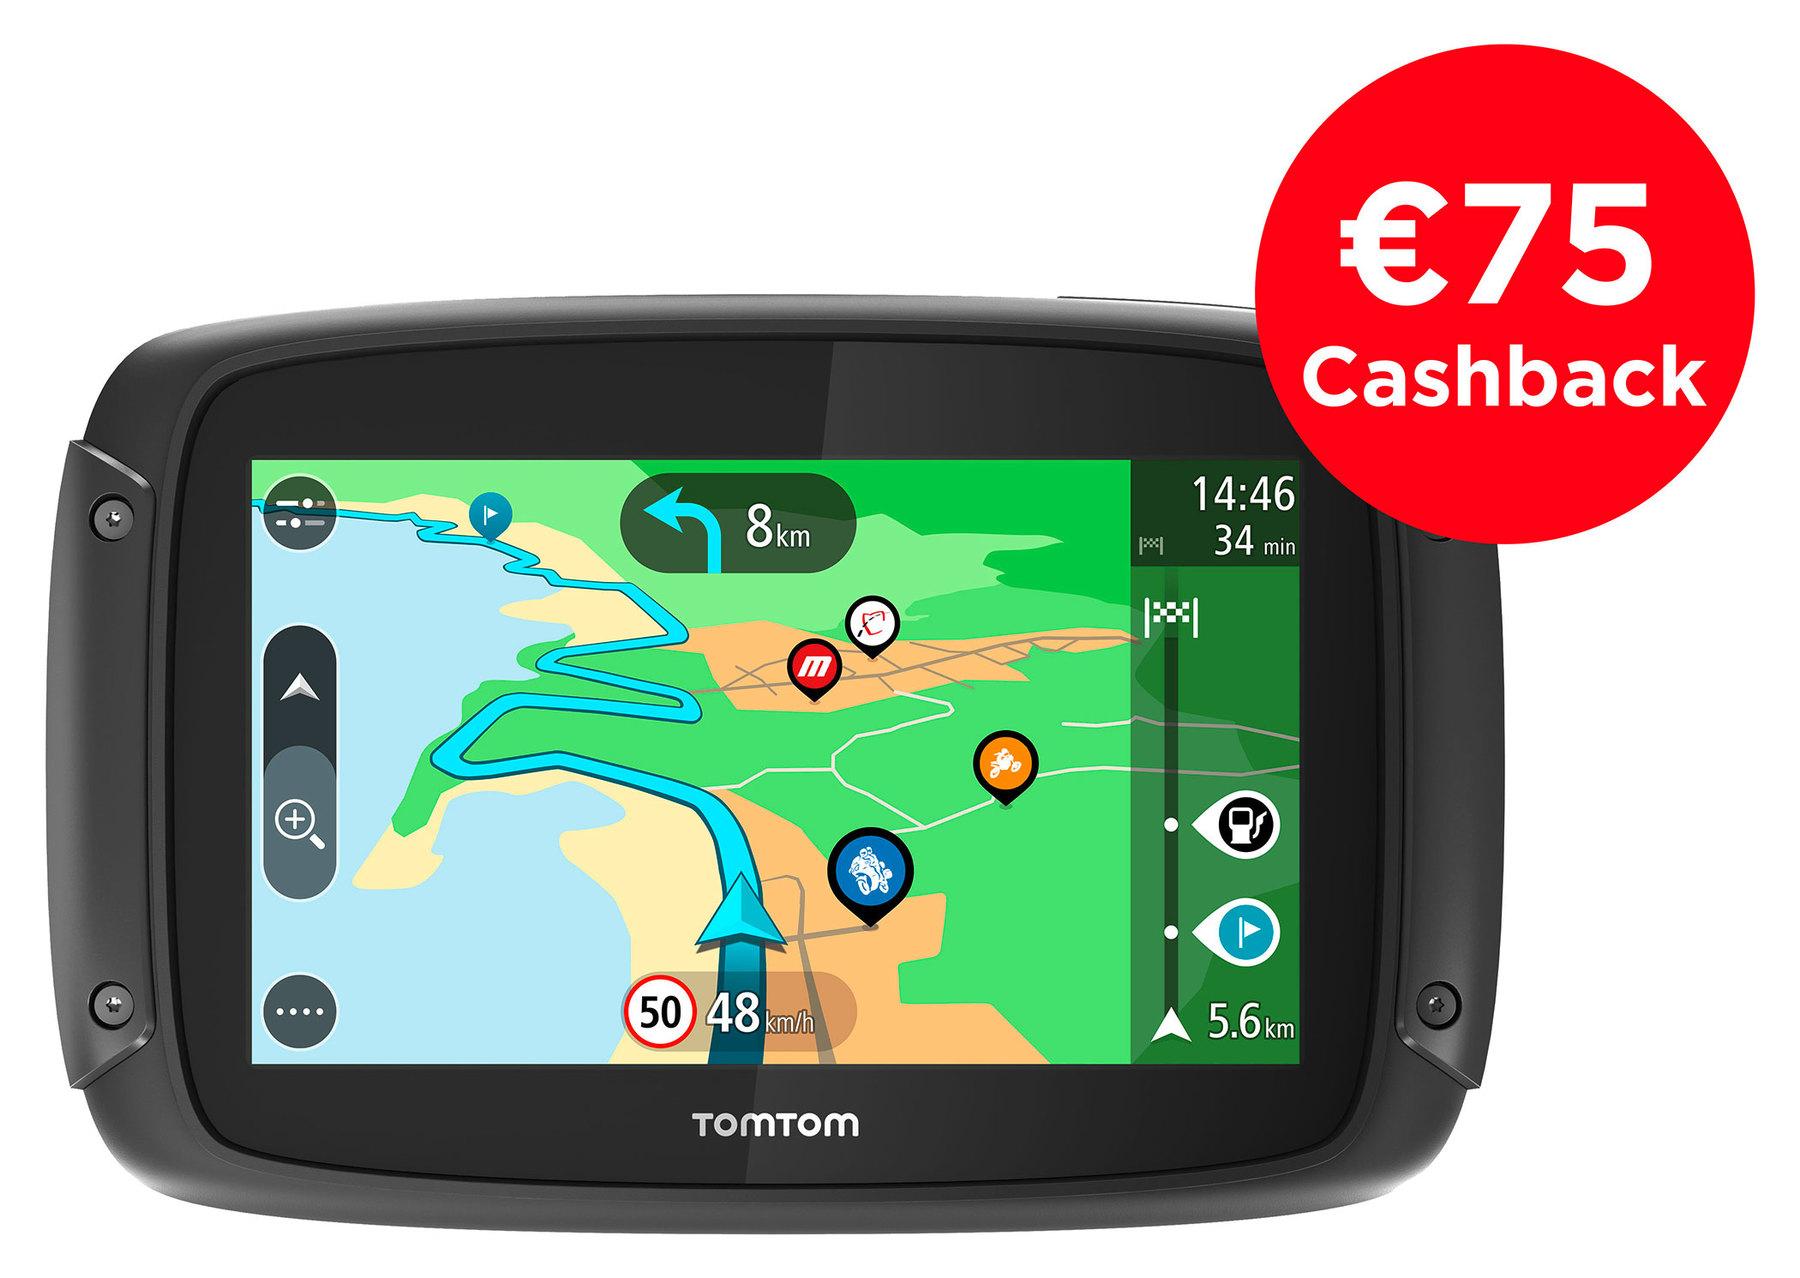 TomTom Cashback: TomTom Rider 550, Navigationssystem - Motorradnavigation